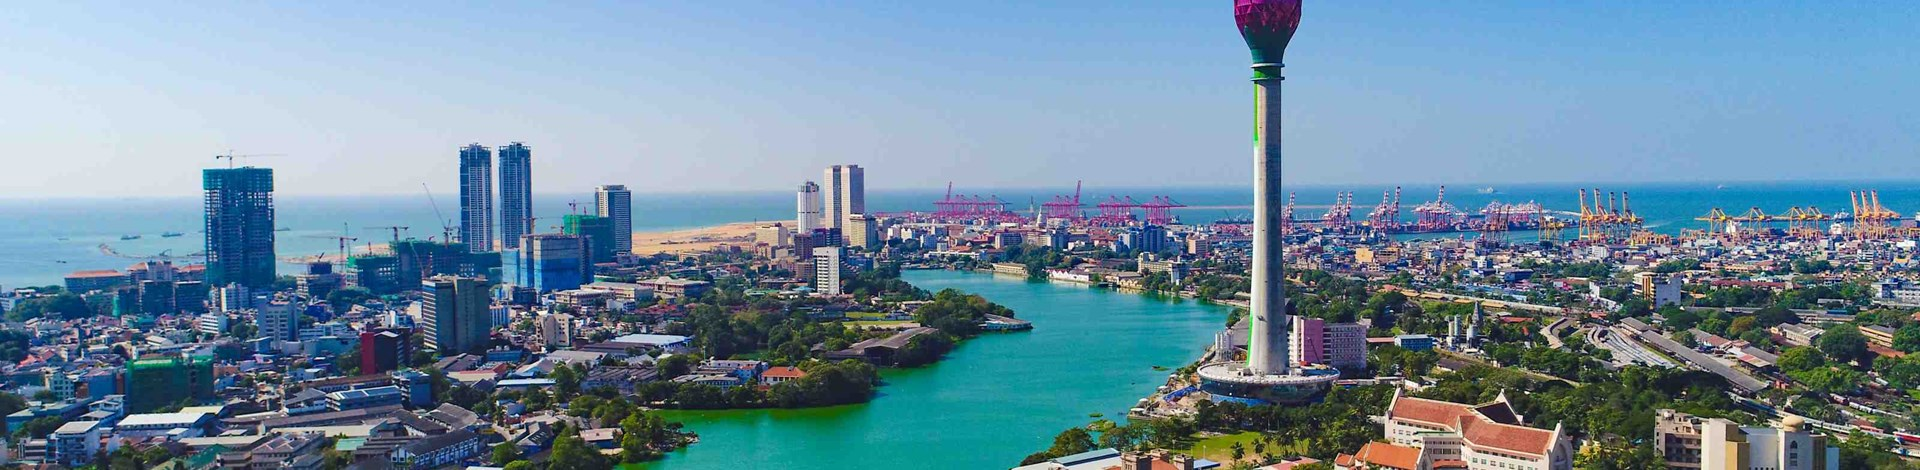 Western Province (Colombo)